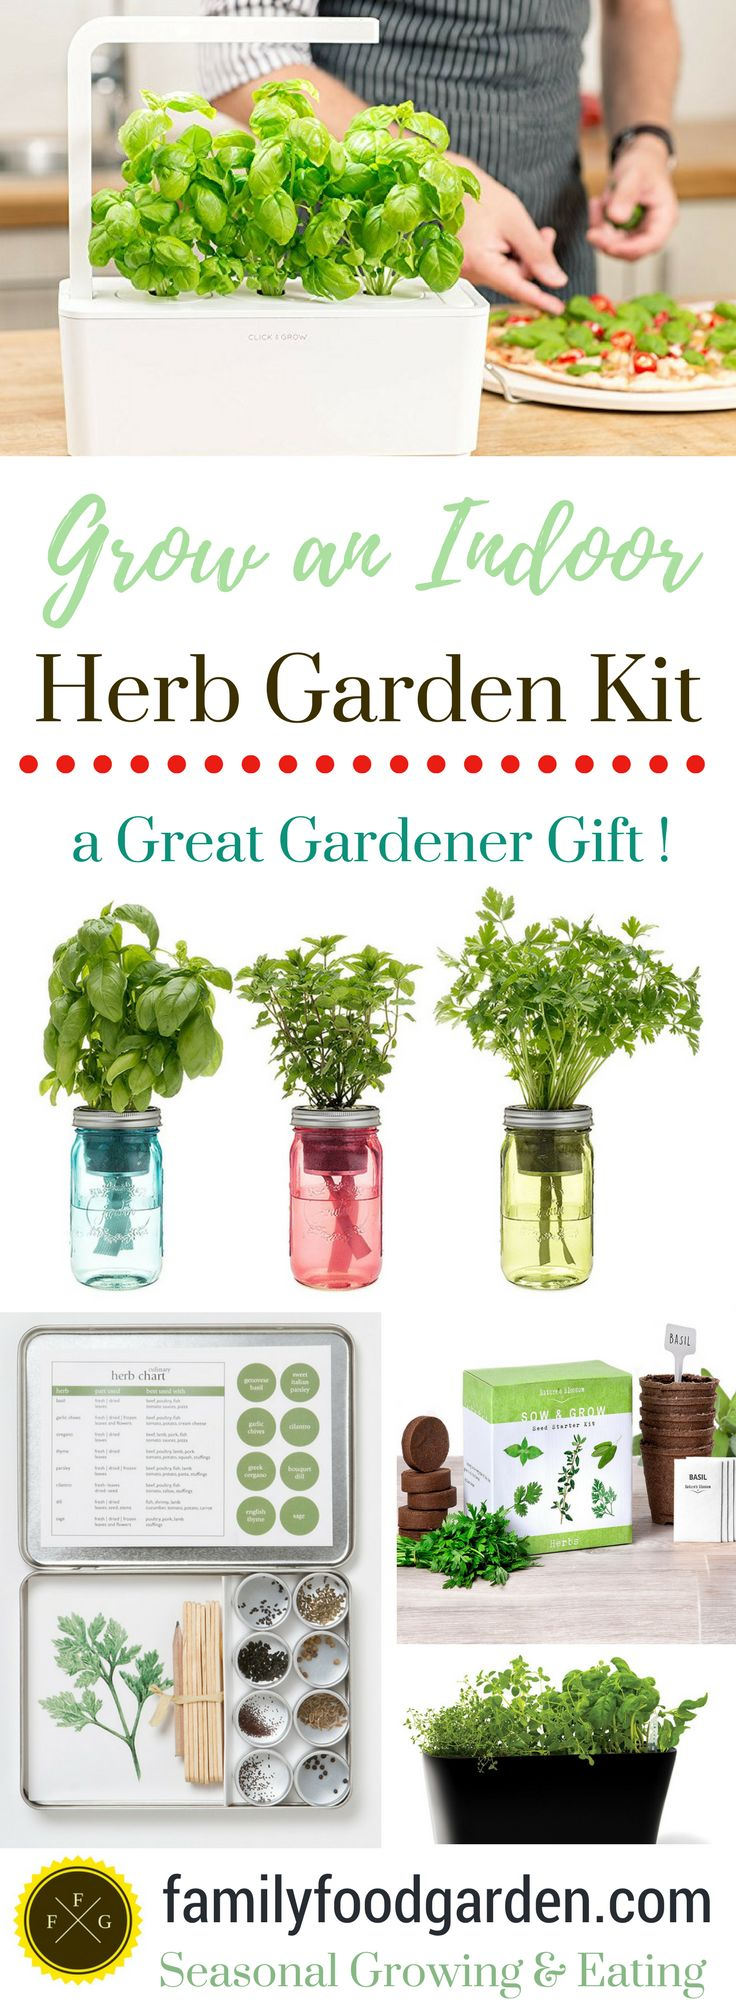 Best 25 Herb Garden Kit Ideas On Pinterest Indoor Grow Kits Hydroponic Grow Kits And Garden